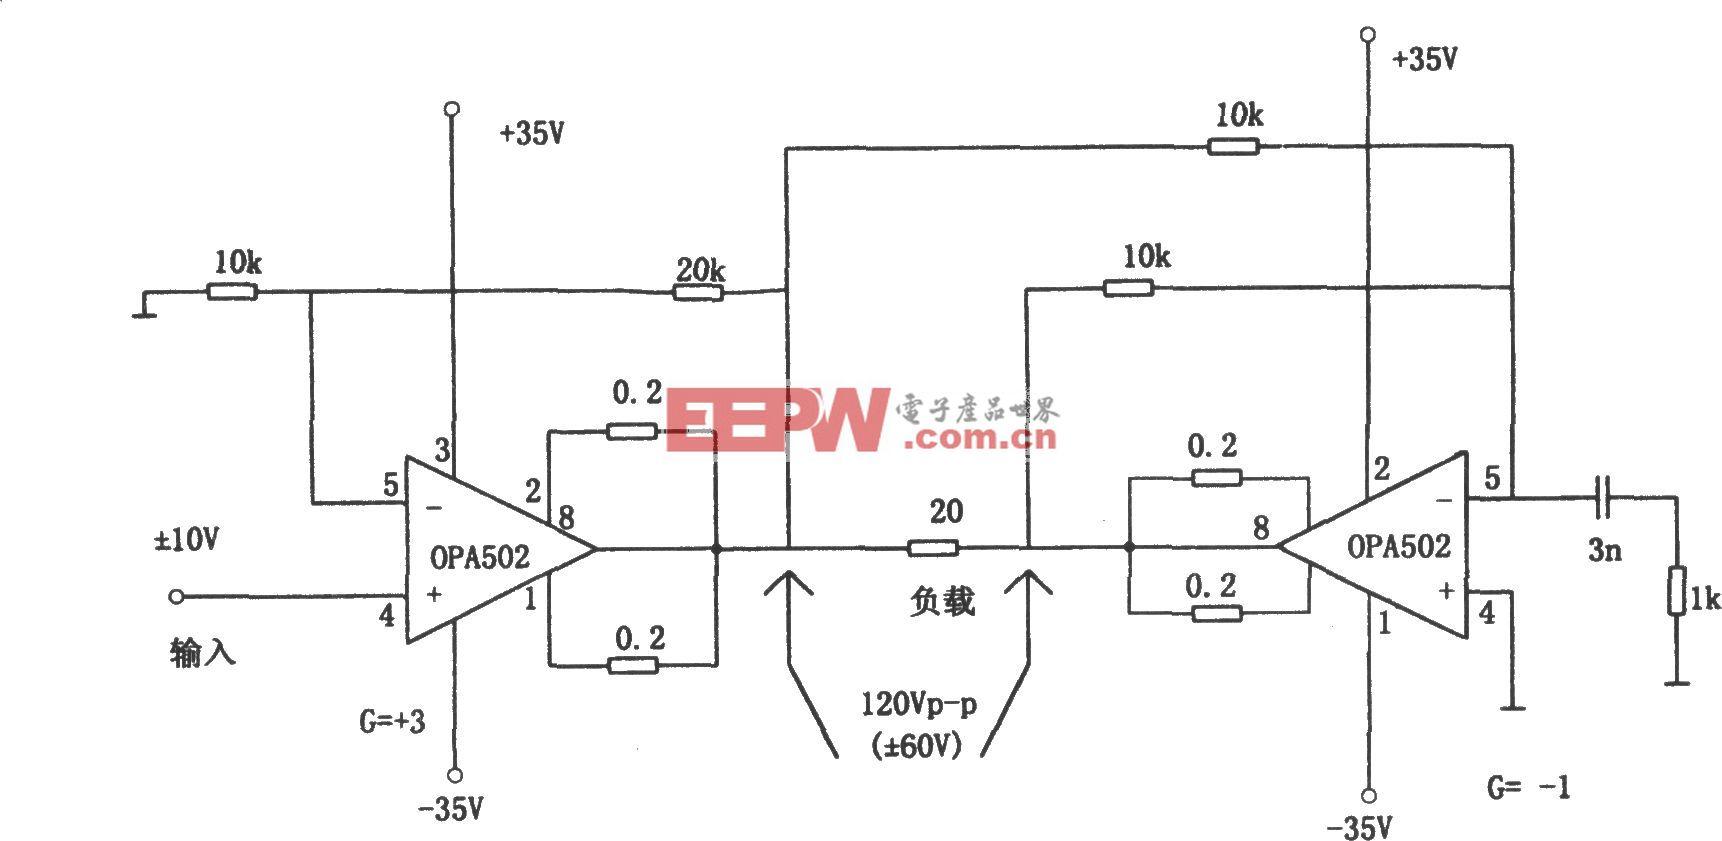 OPA502构成的桥氏驱动电路